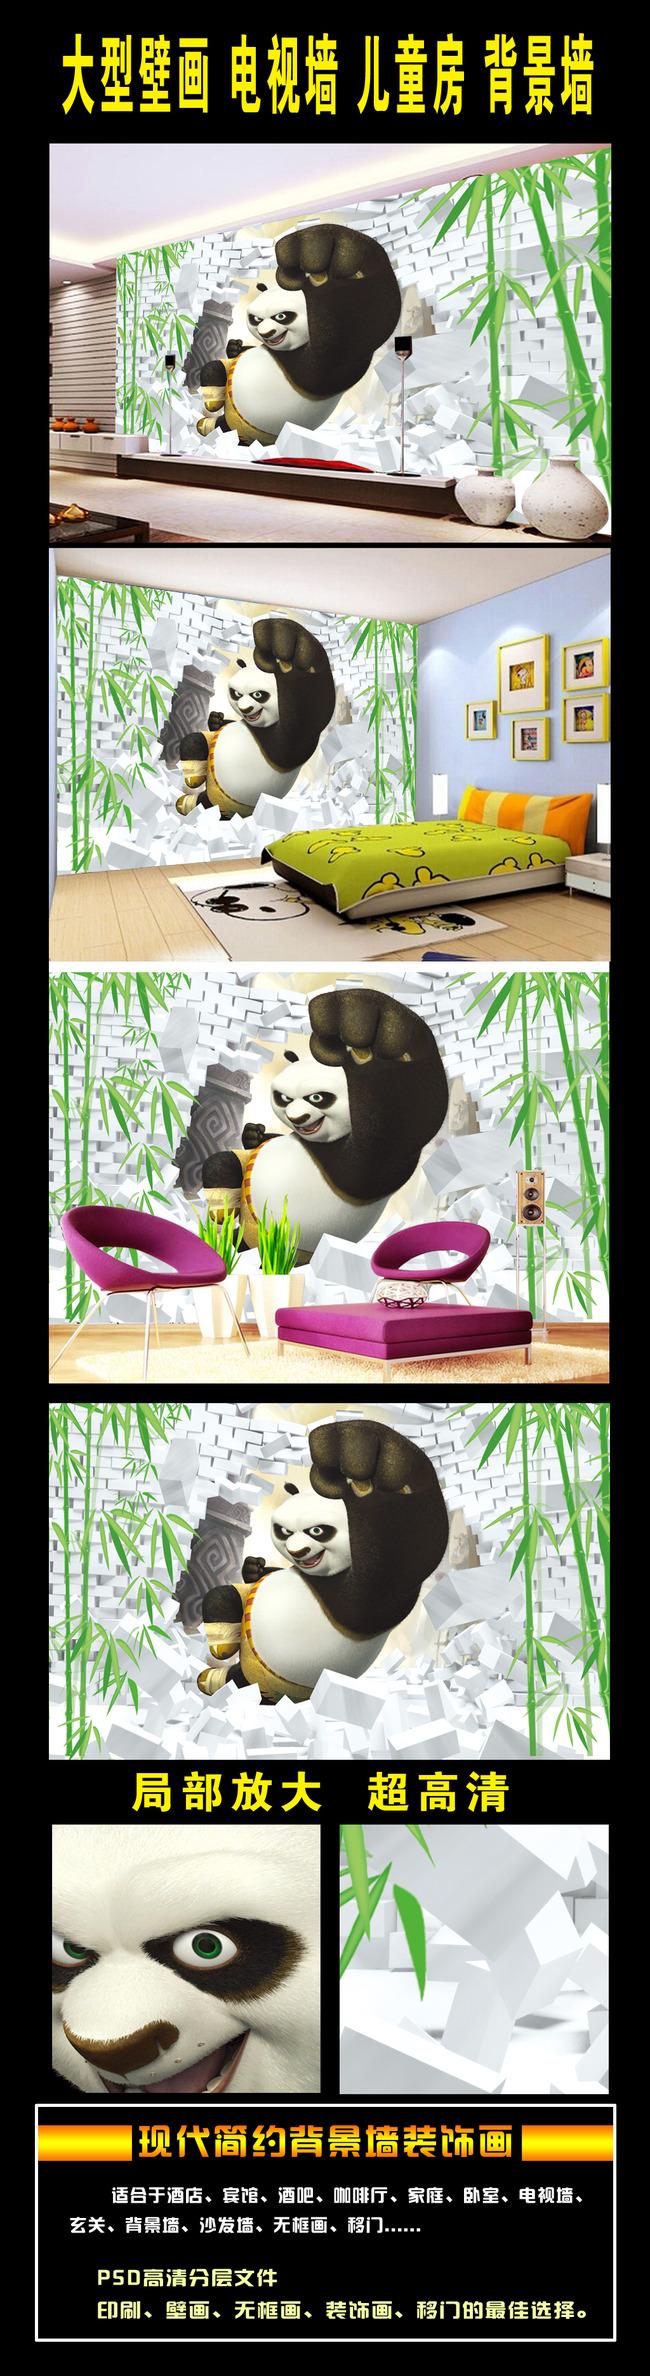 3d立体功夫熊猫竹子客厅电视背景墙